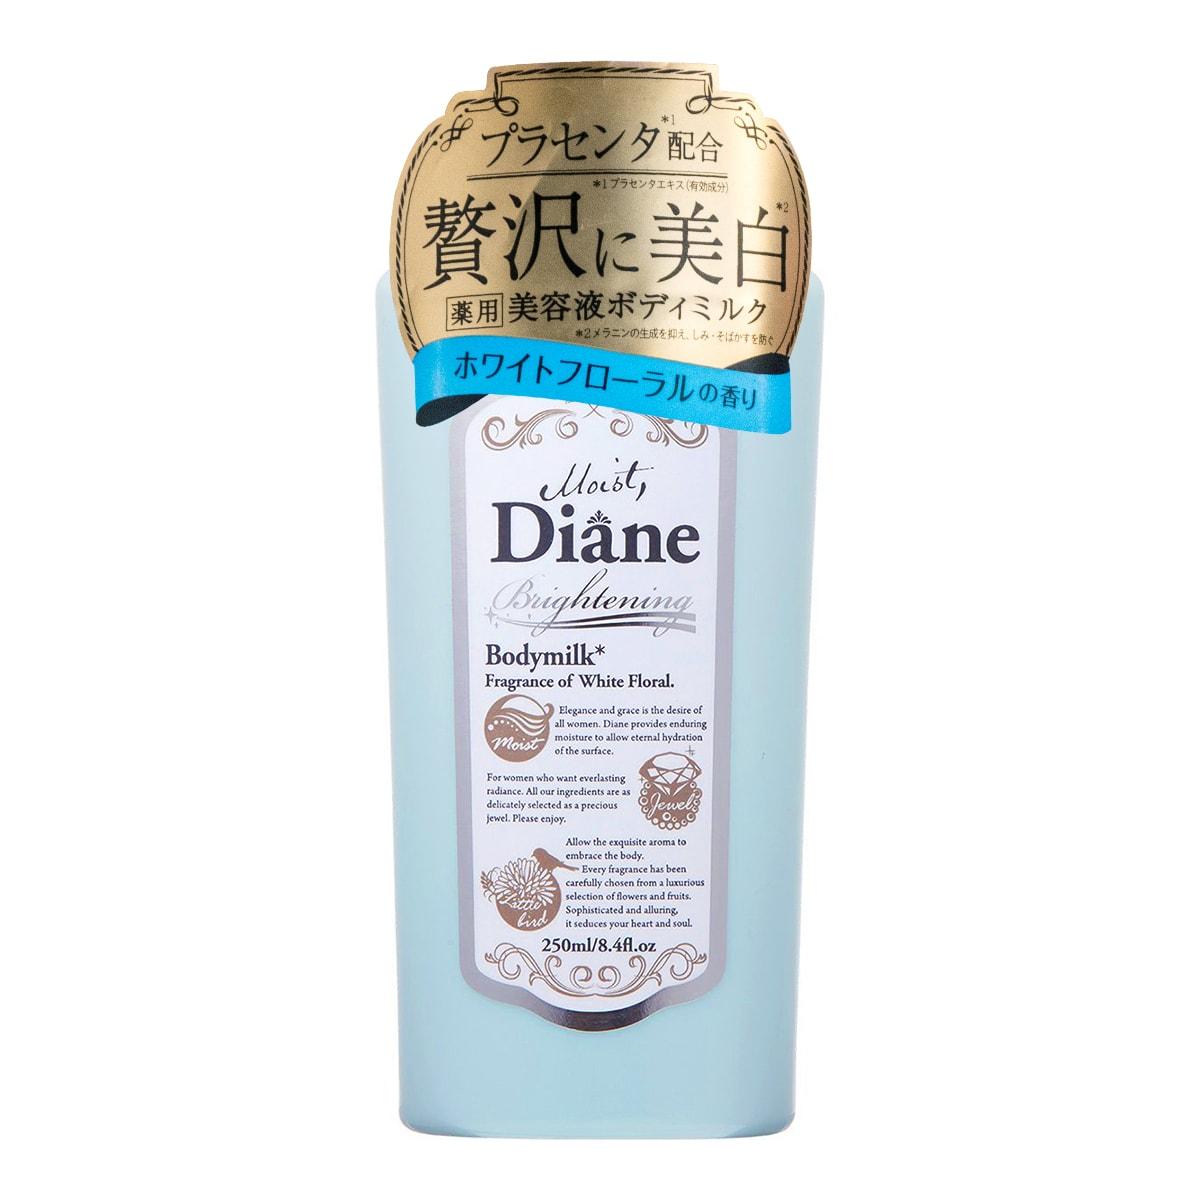 MOIST DIANE Body Milk Brightening White Floral Fragrance 250ml